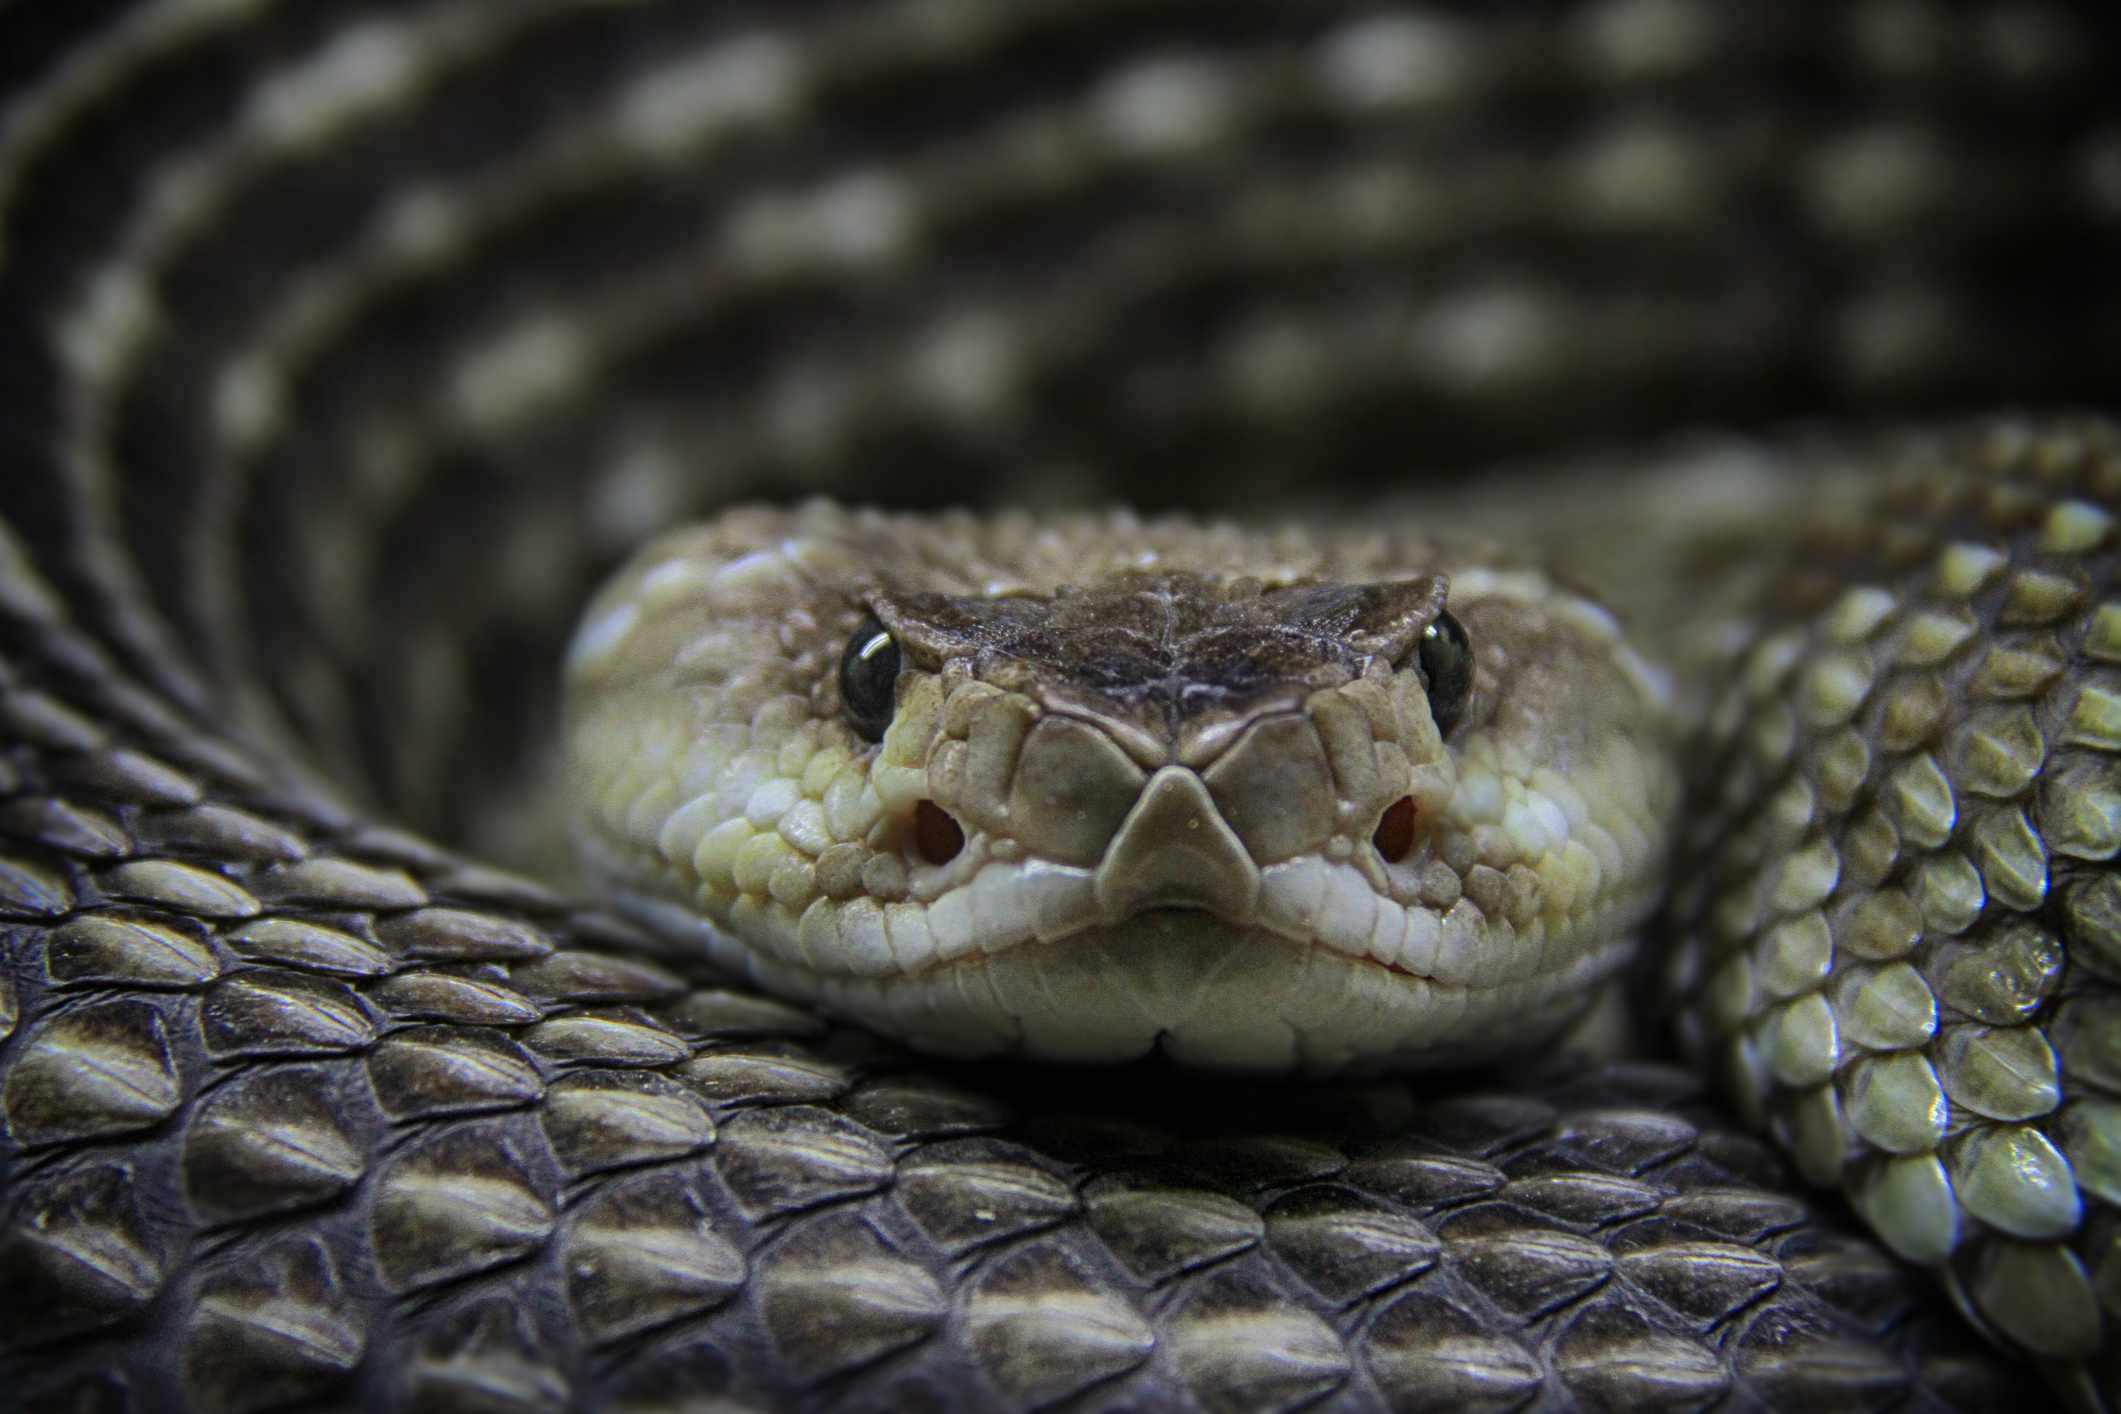 A rattlesnake pit viper its pit organs to sense infrared light